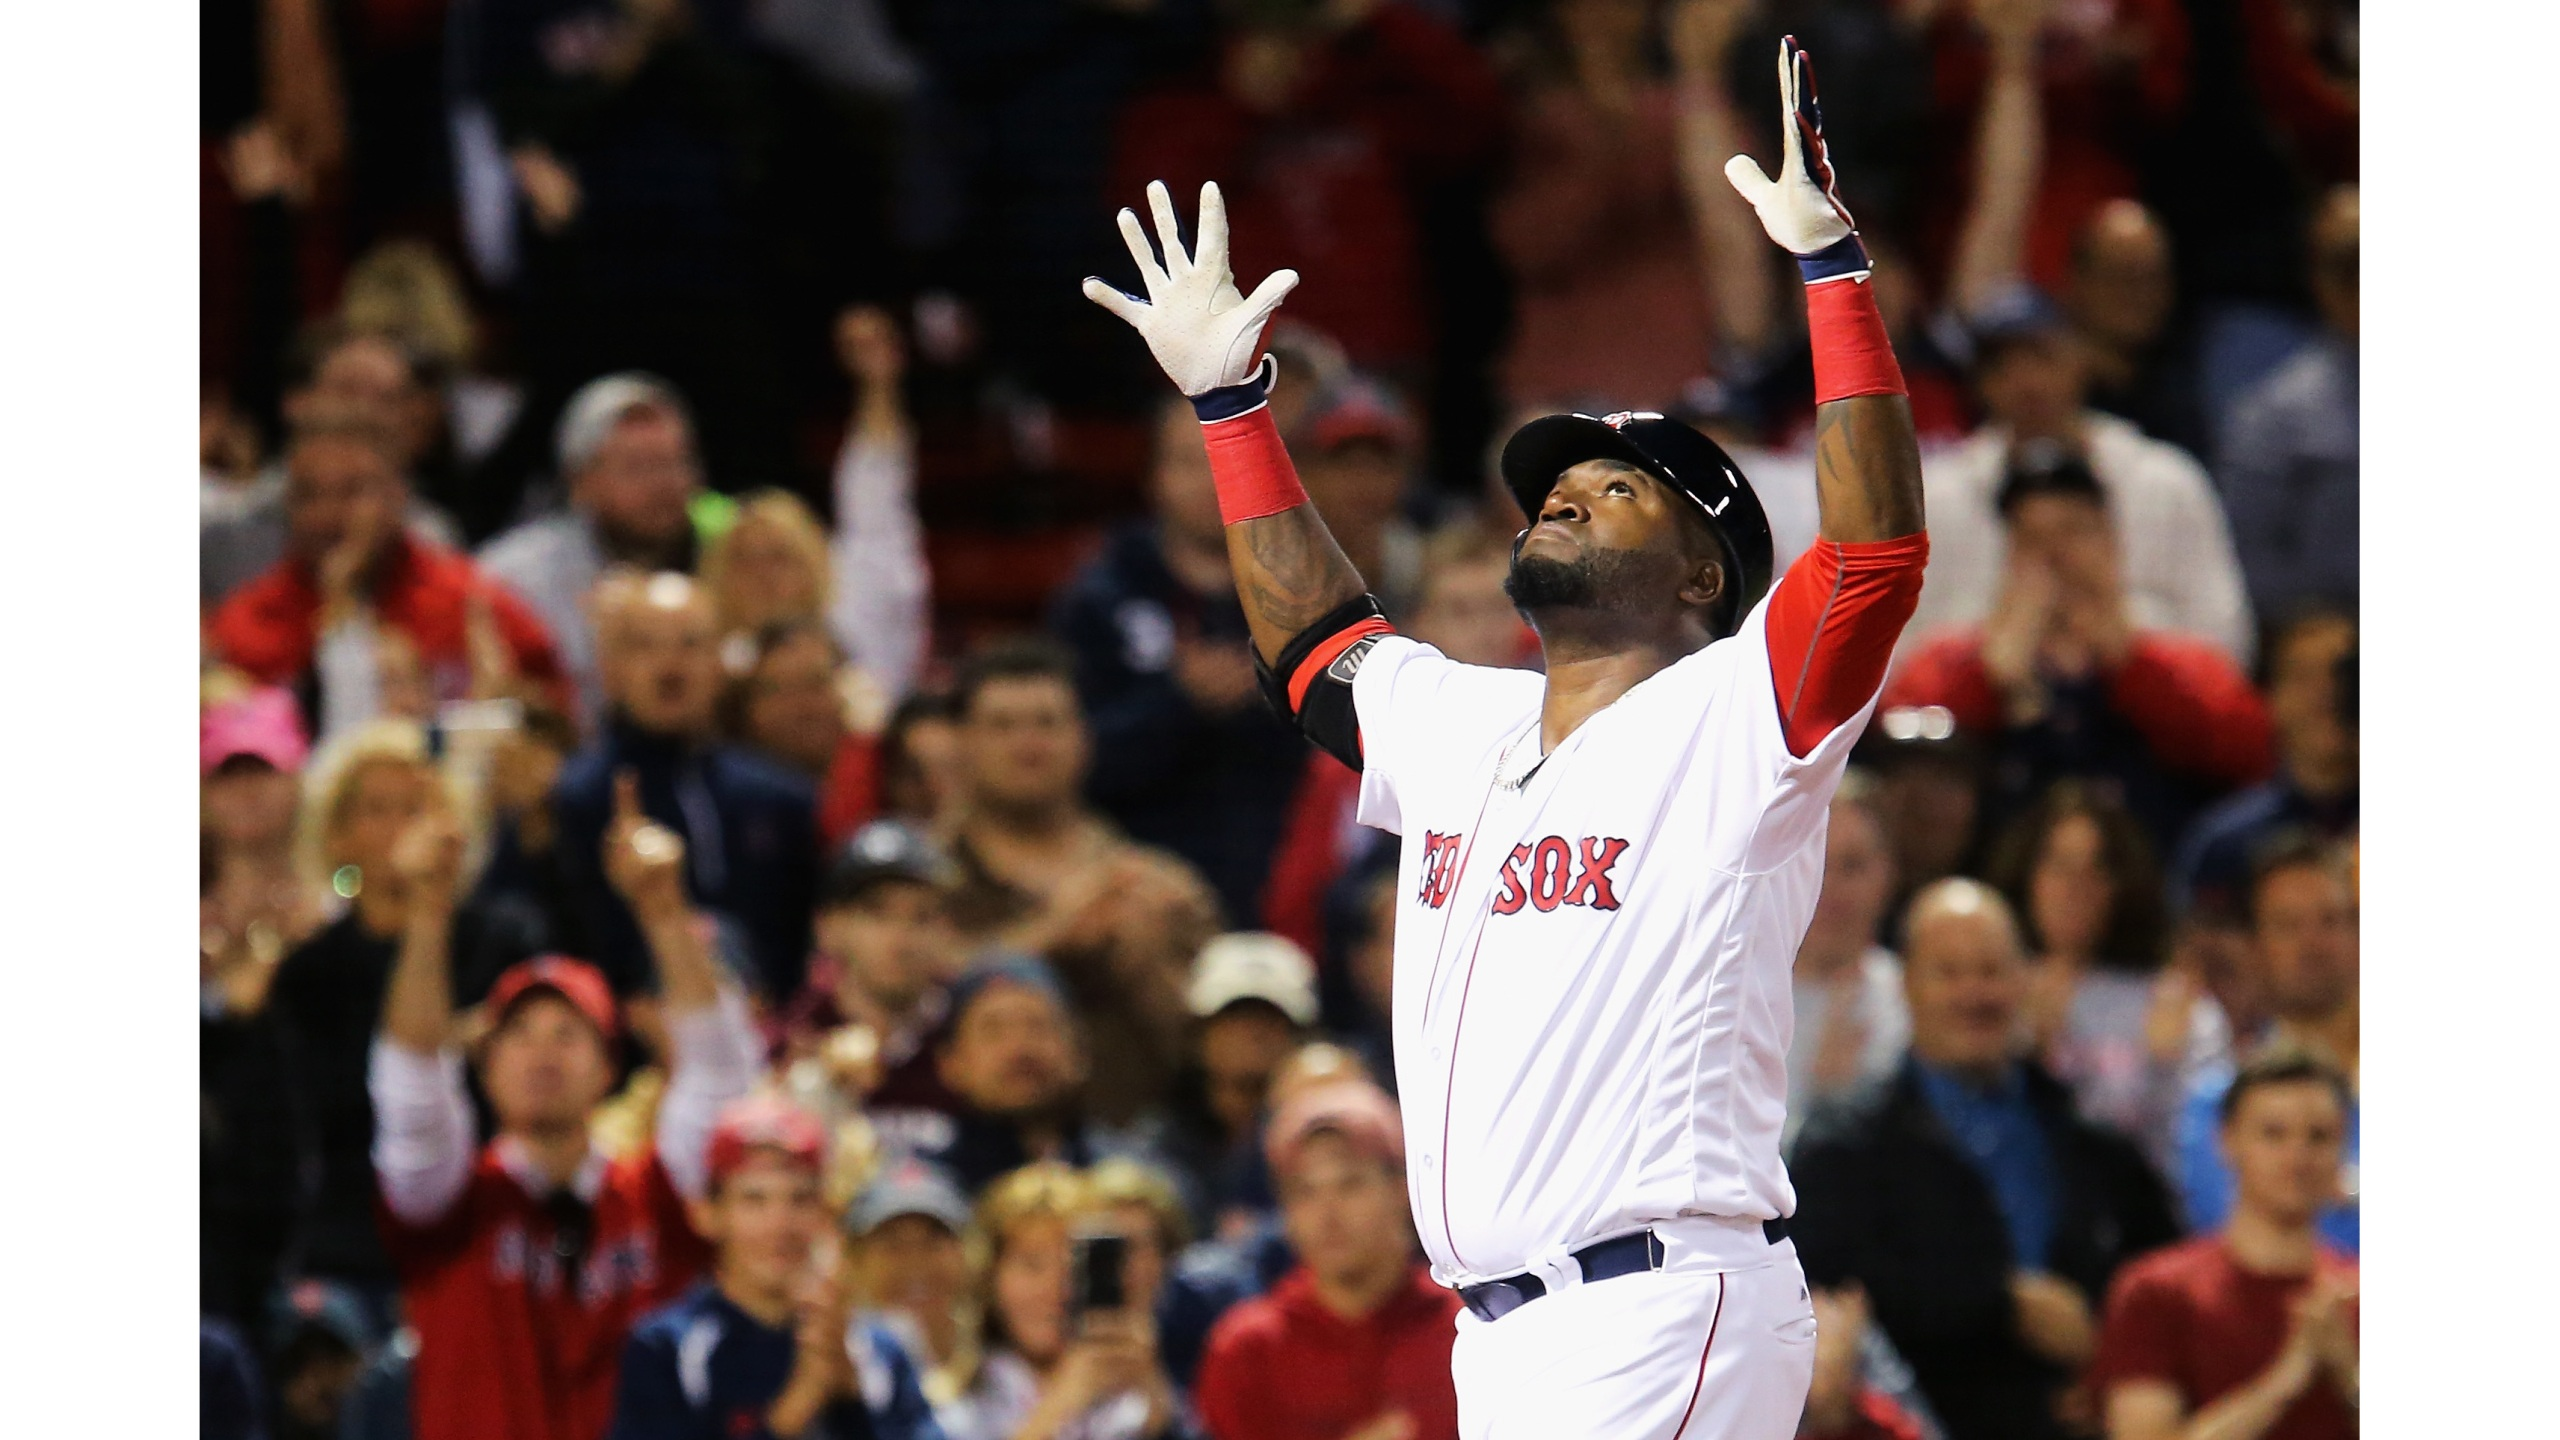 Reports: Former Red Sox player David Ortiz shot in Dominican Republic